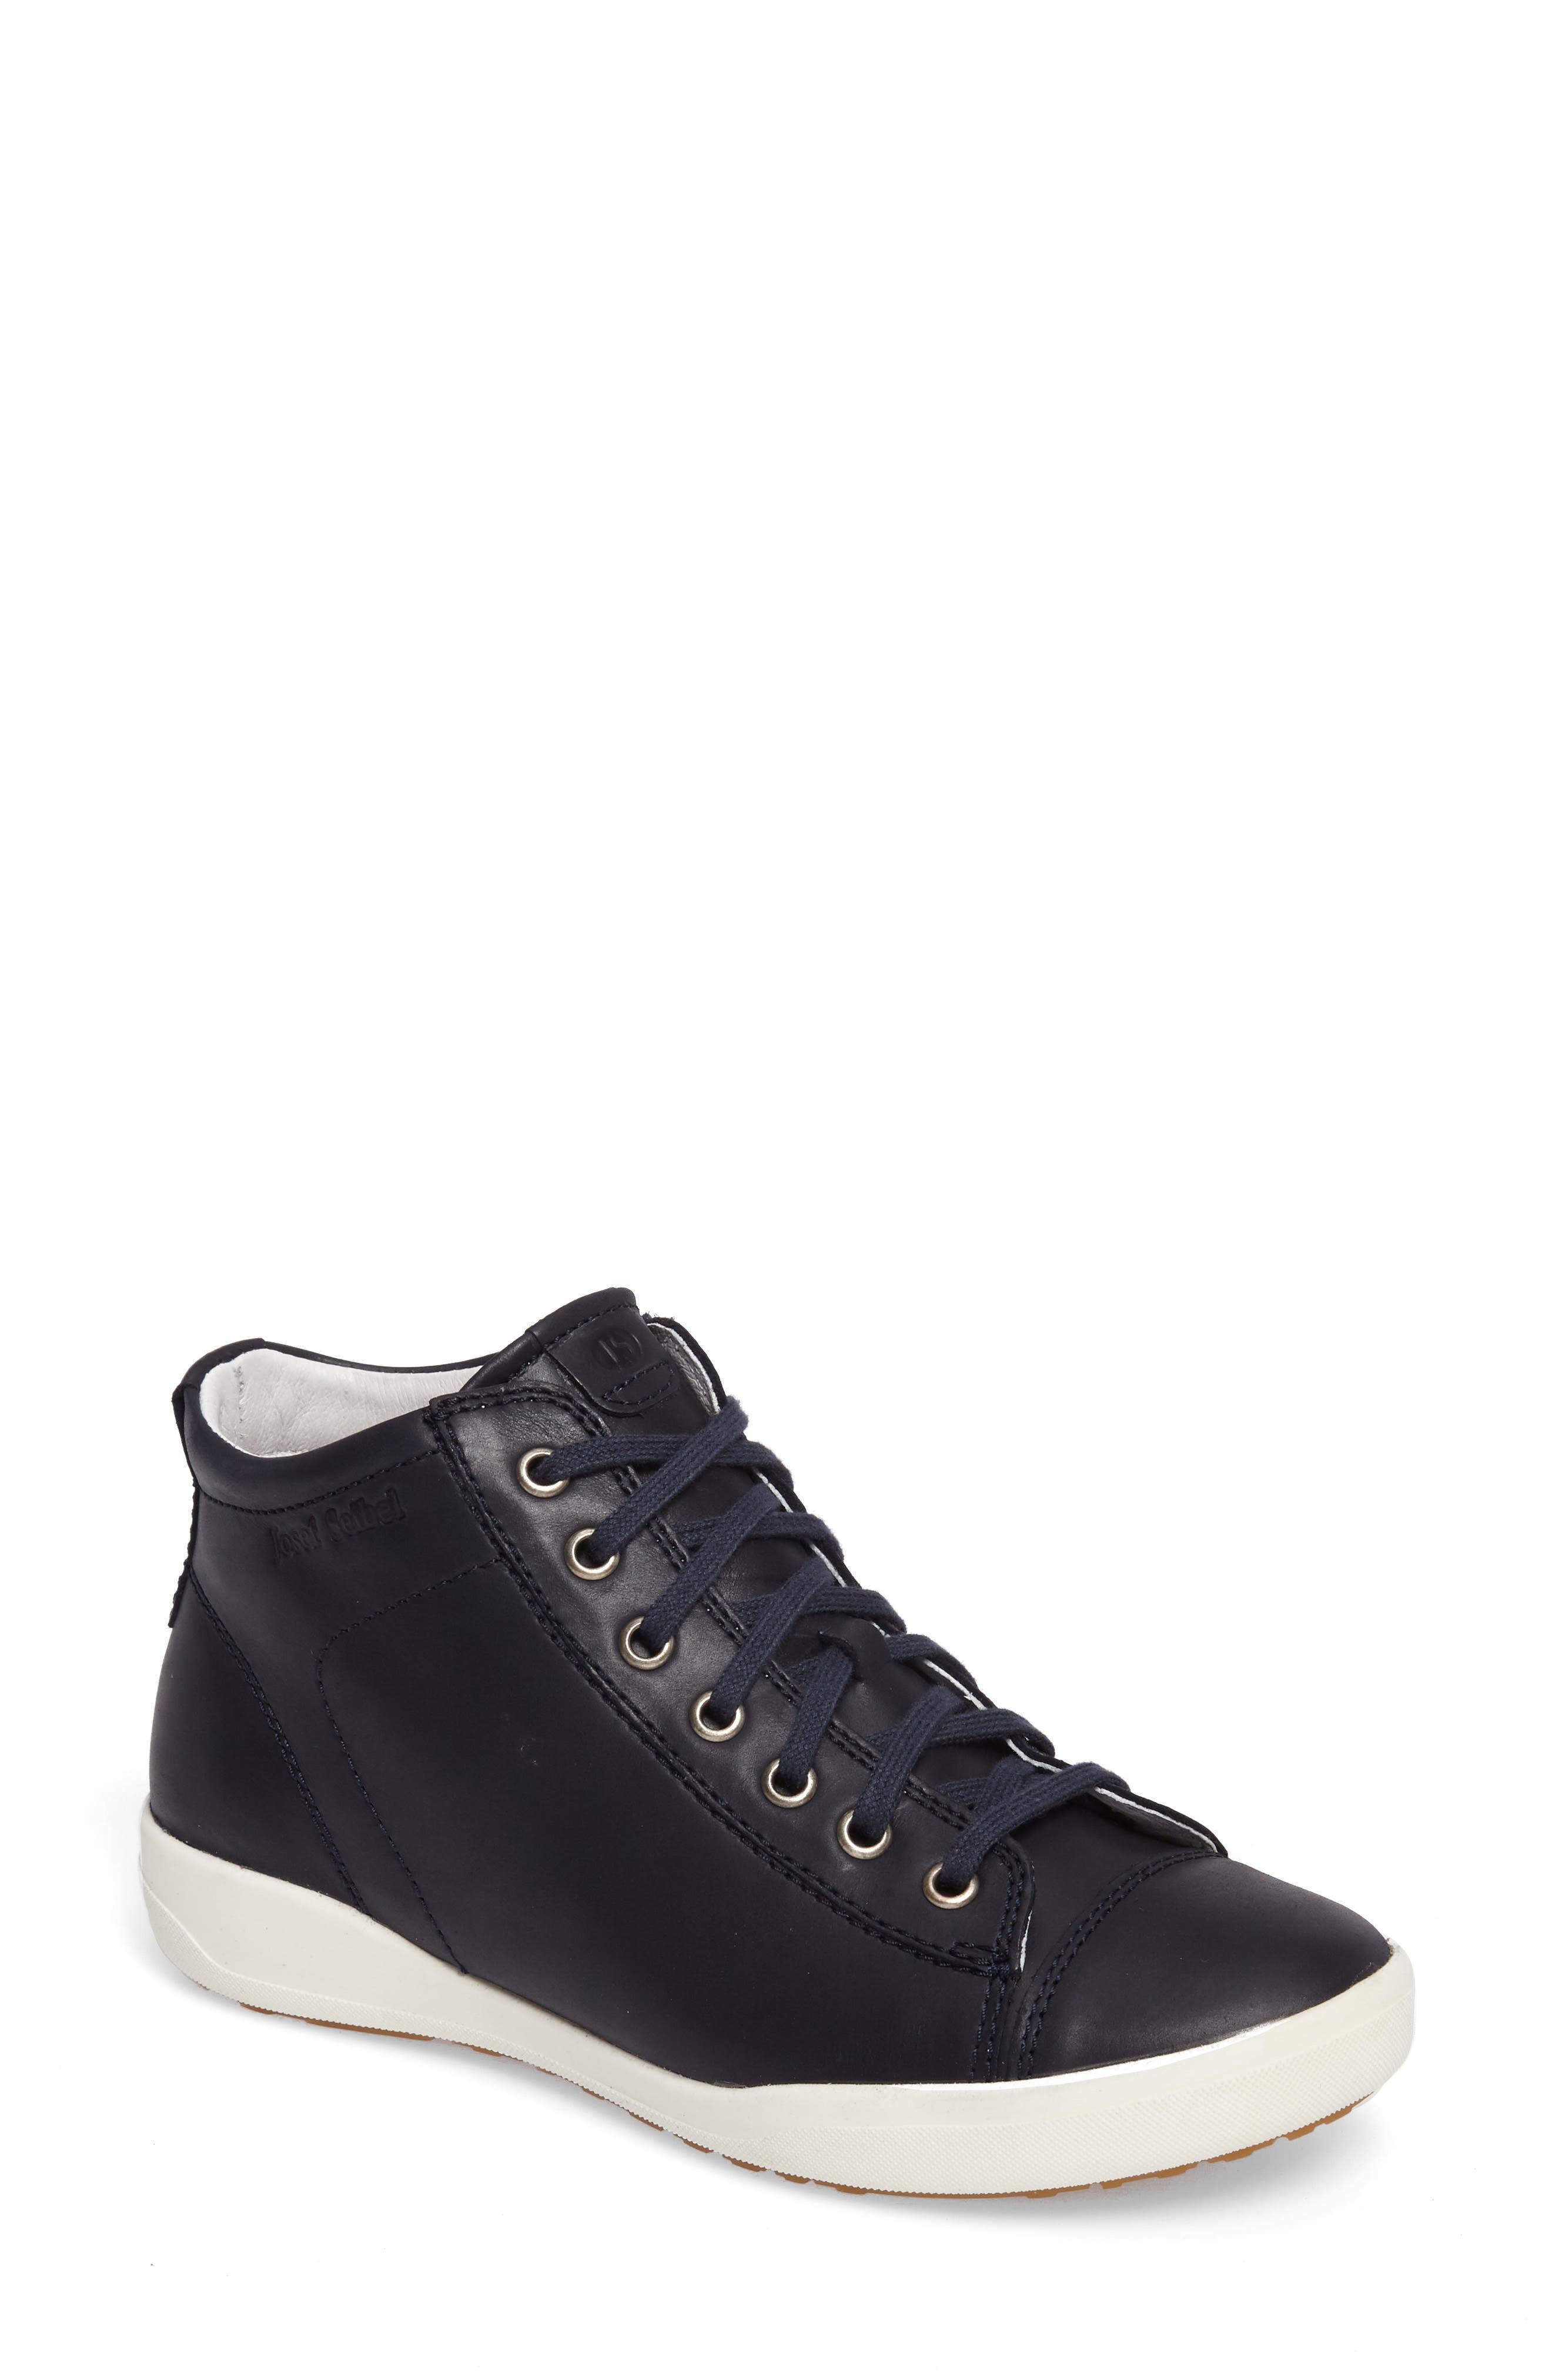 Sina 17 Sneaker,                         Main,                         color, 401